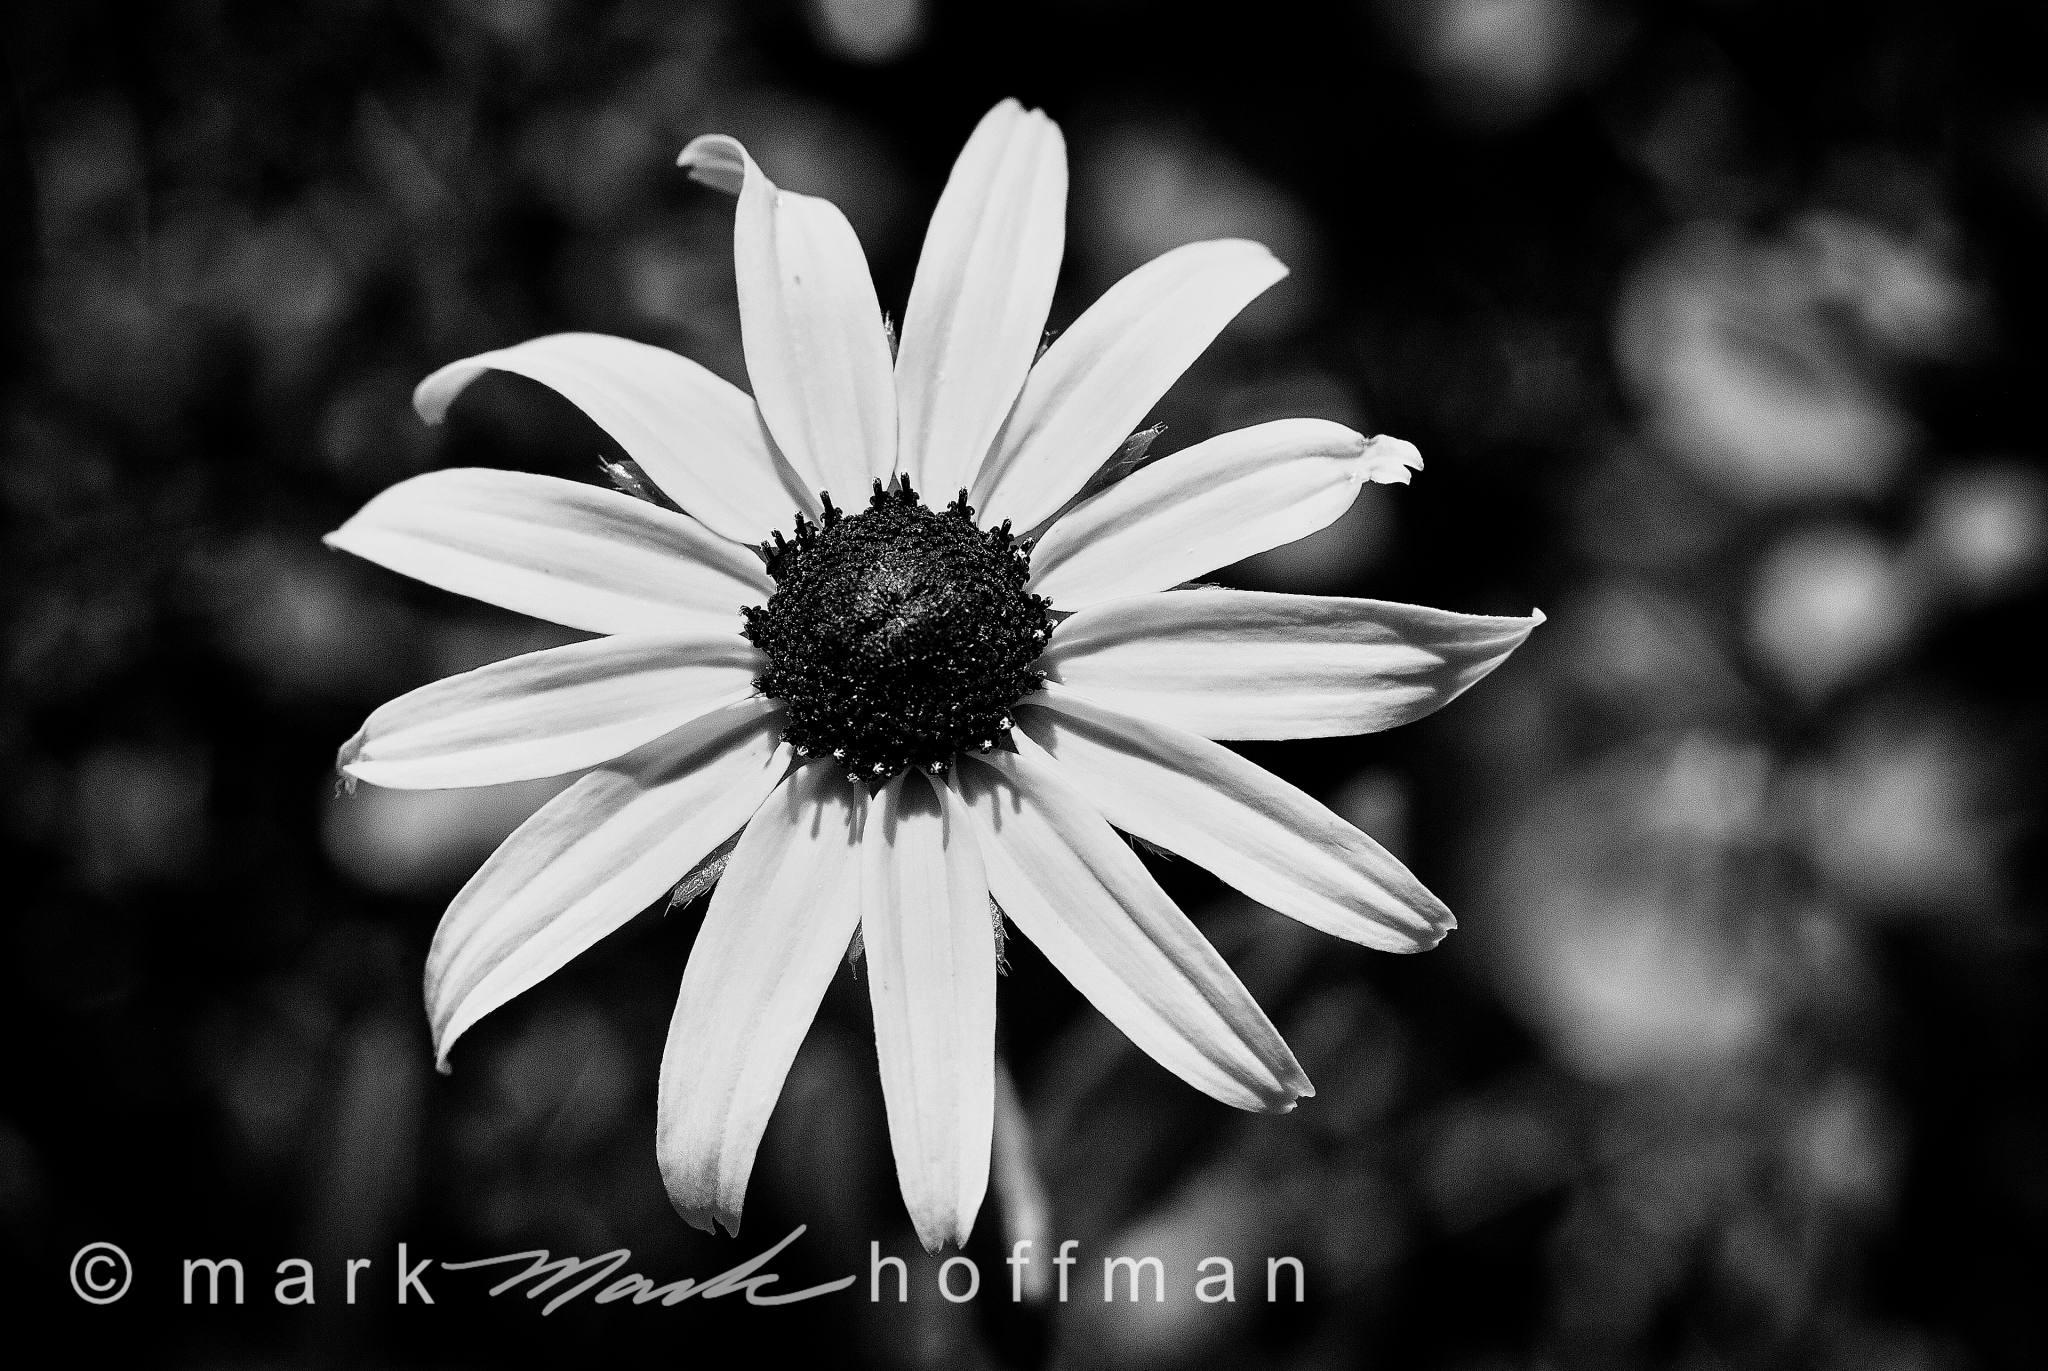 Mark_Hoffman_ND24938-Edit_cap1_var1.jpg